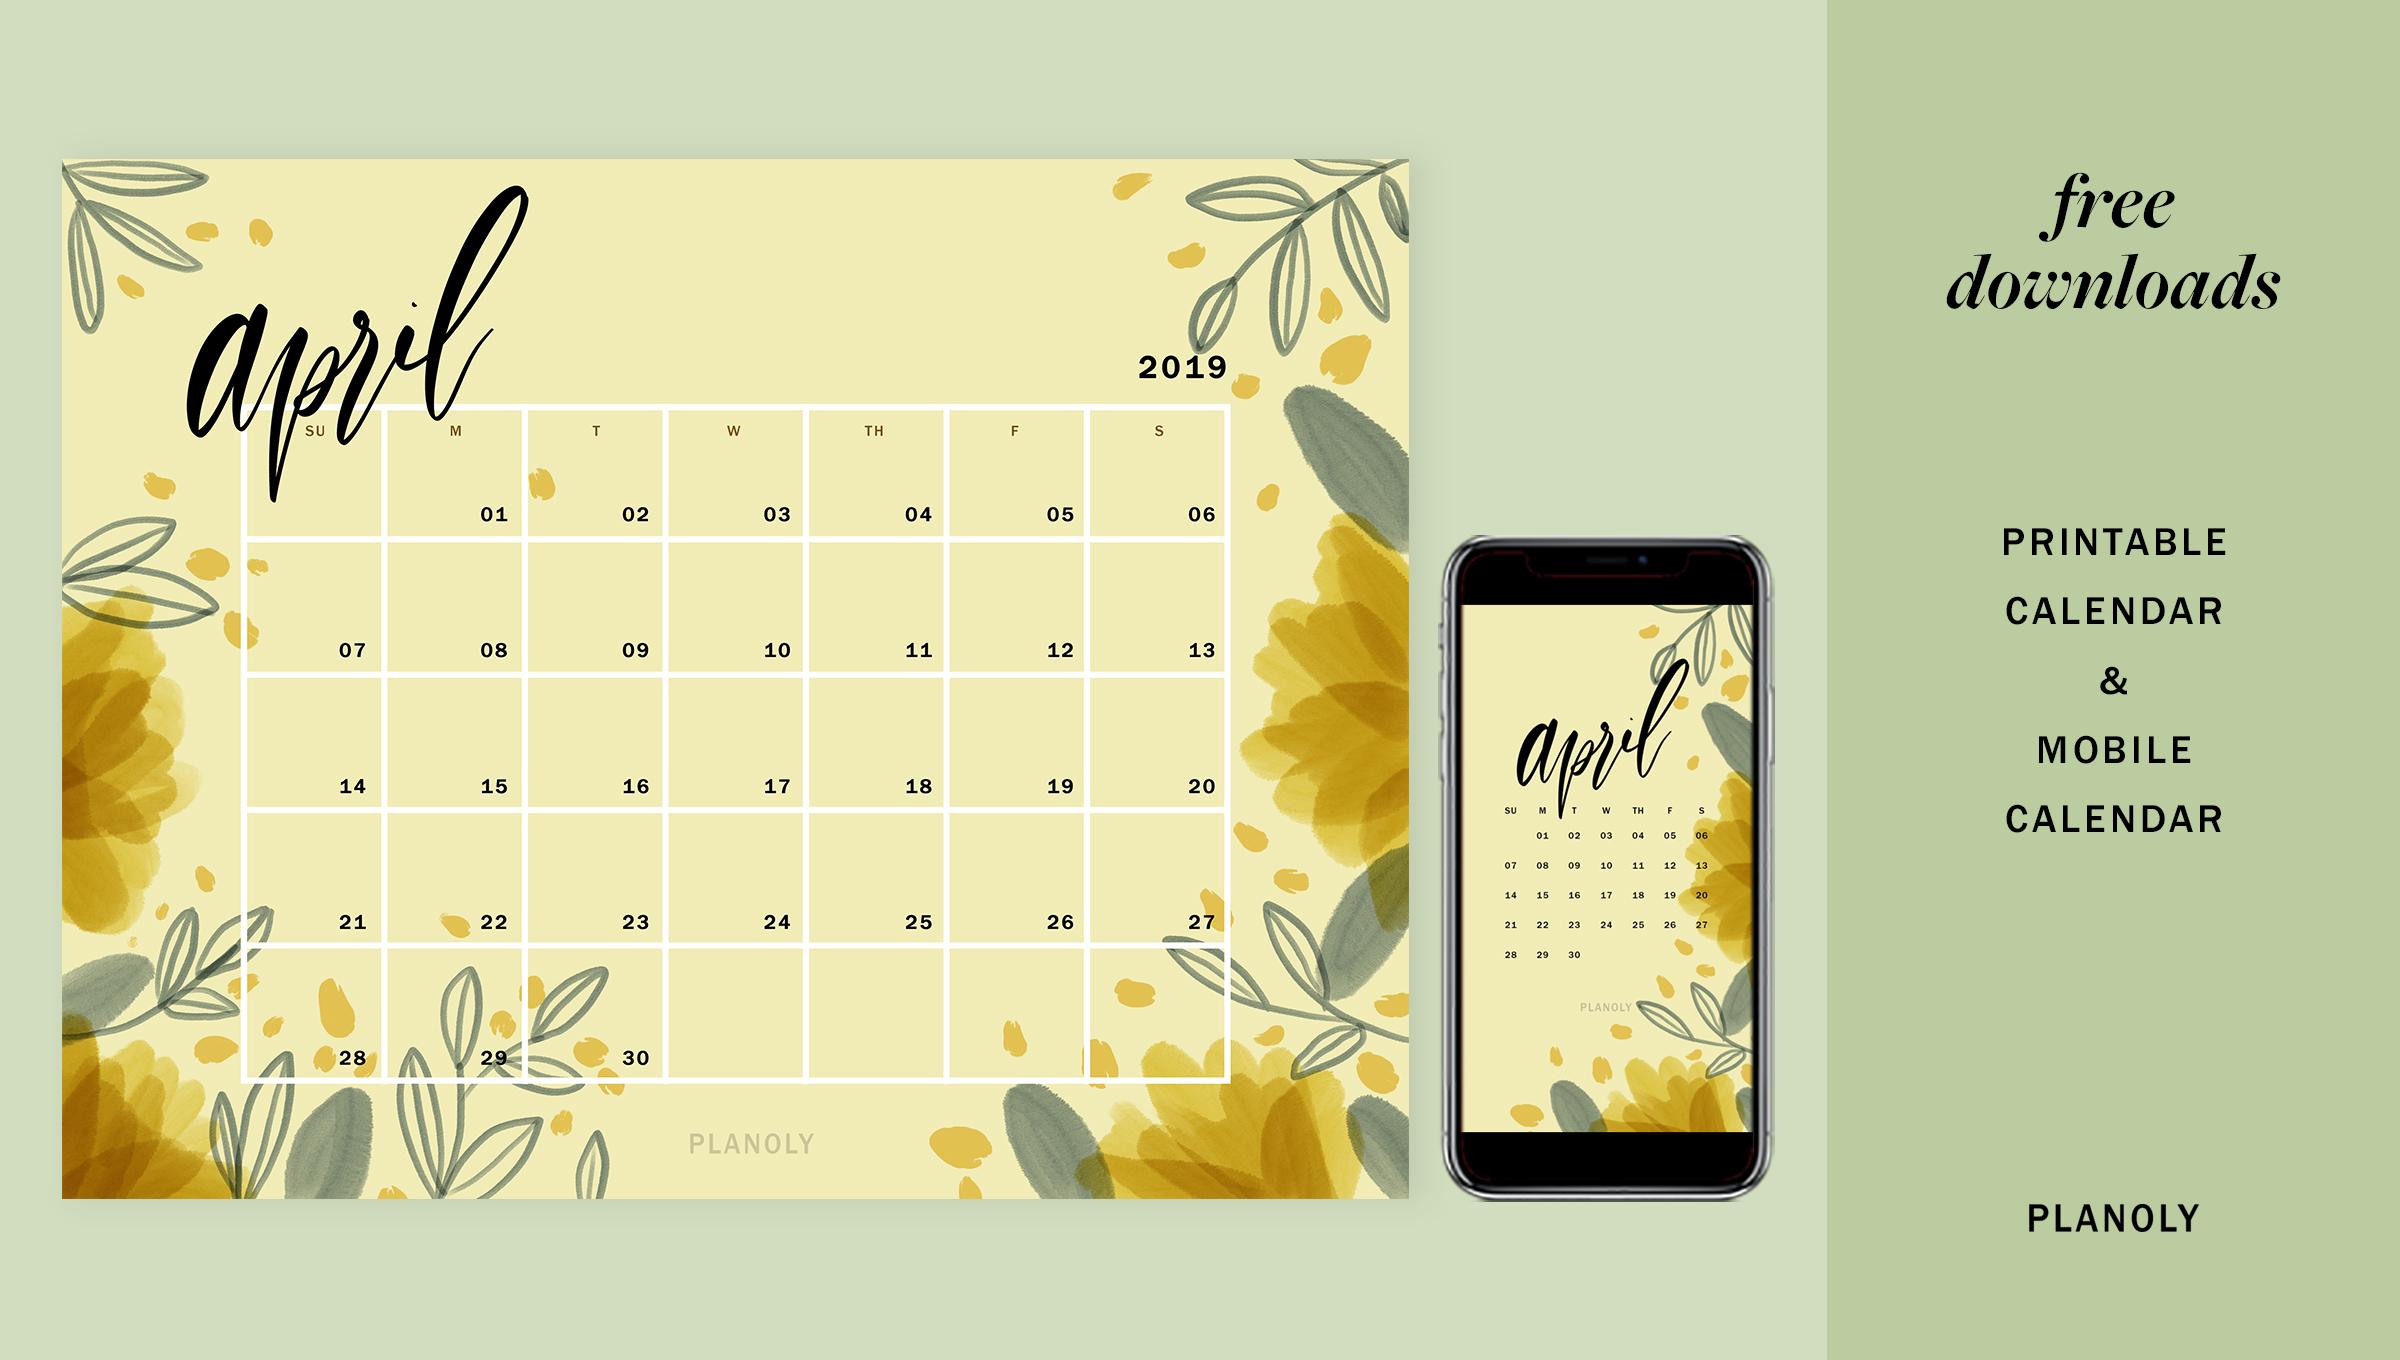 Q2 2019 Content Calendars